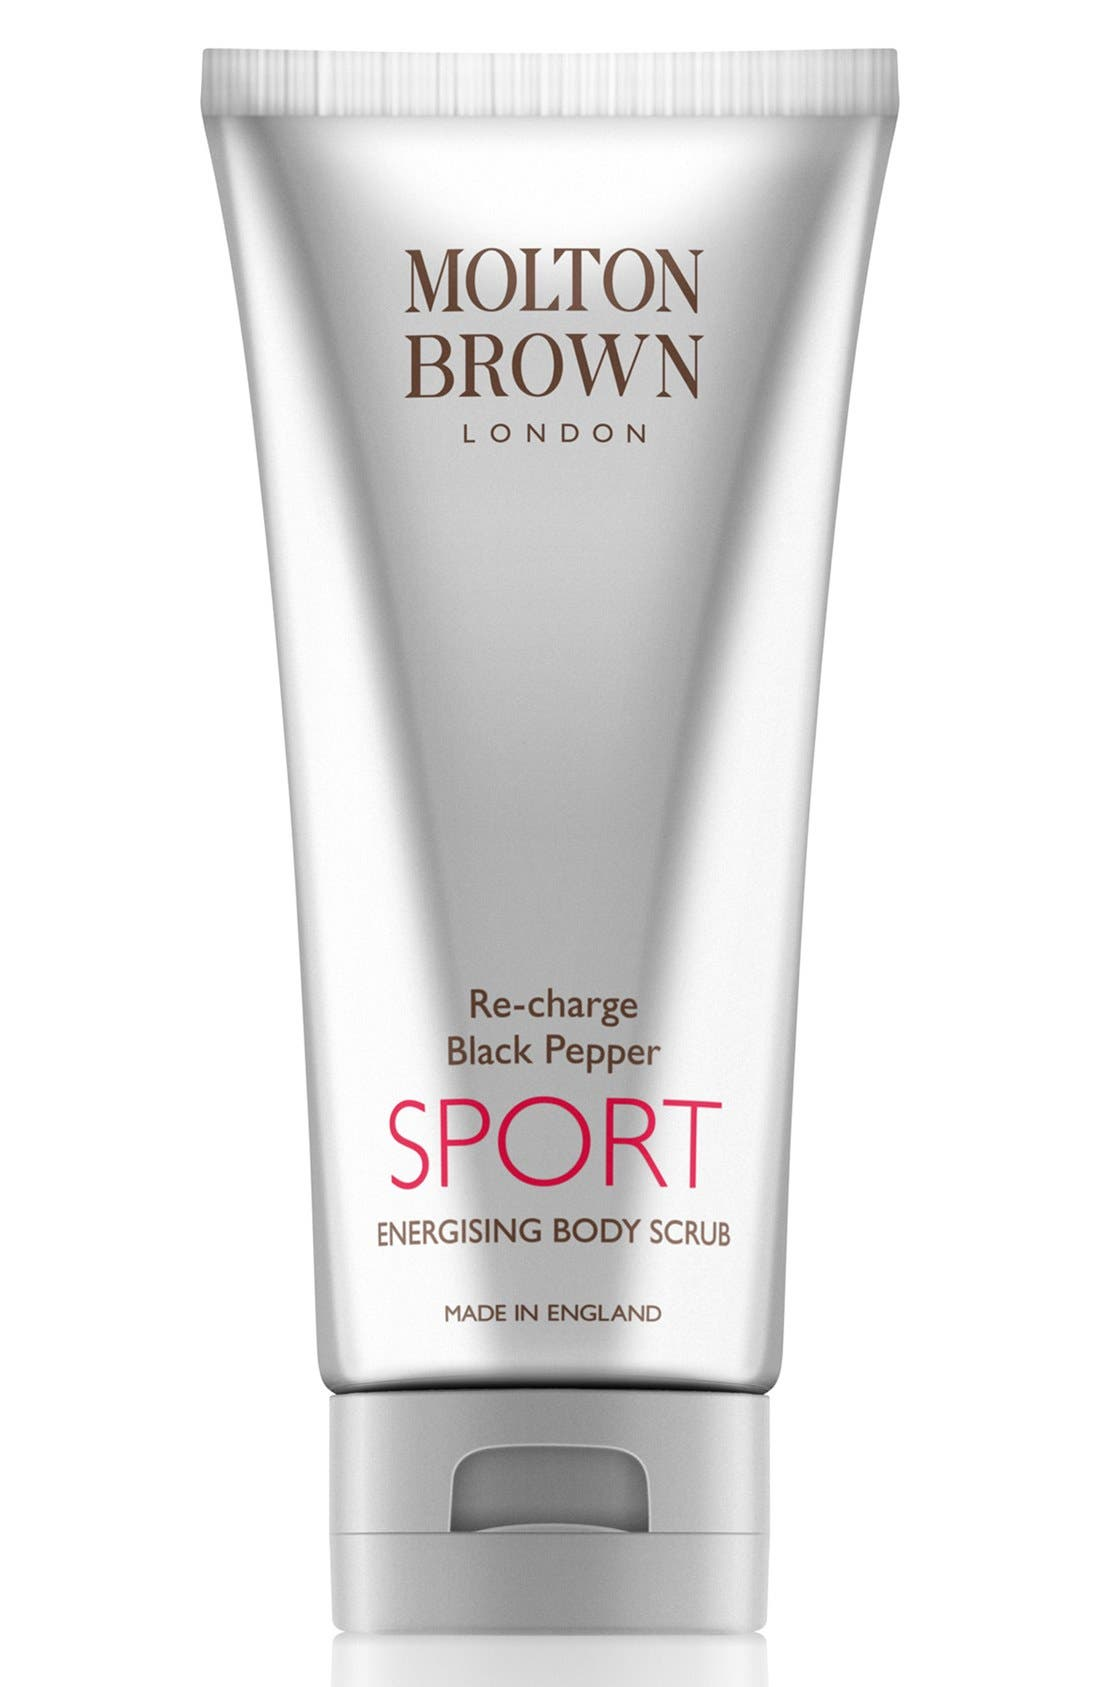 MOLTON BROWN London Re-charge Black Pepper Sport Energizing Body Scrub